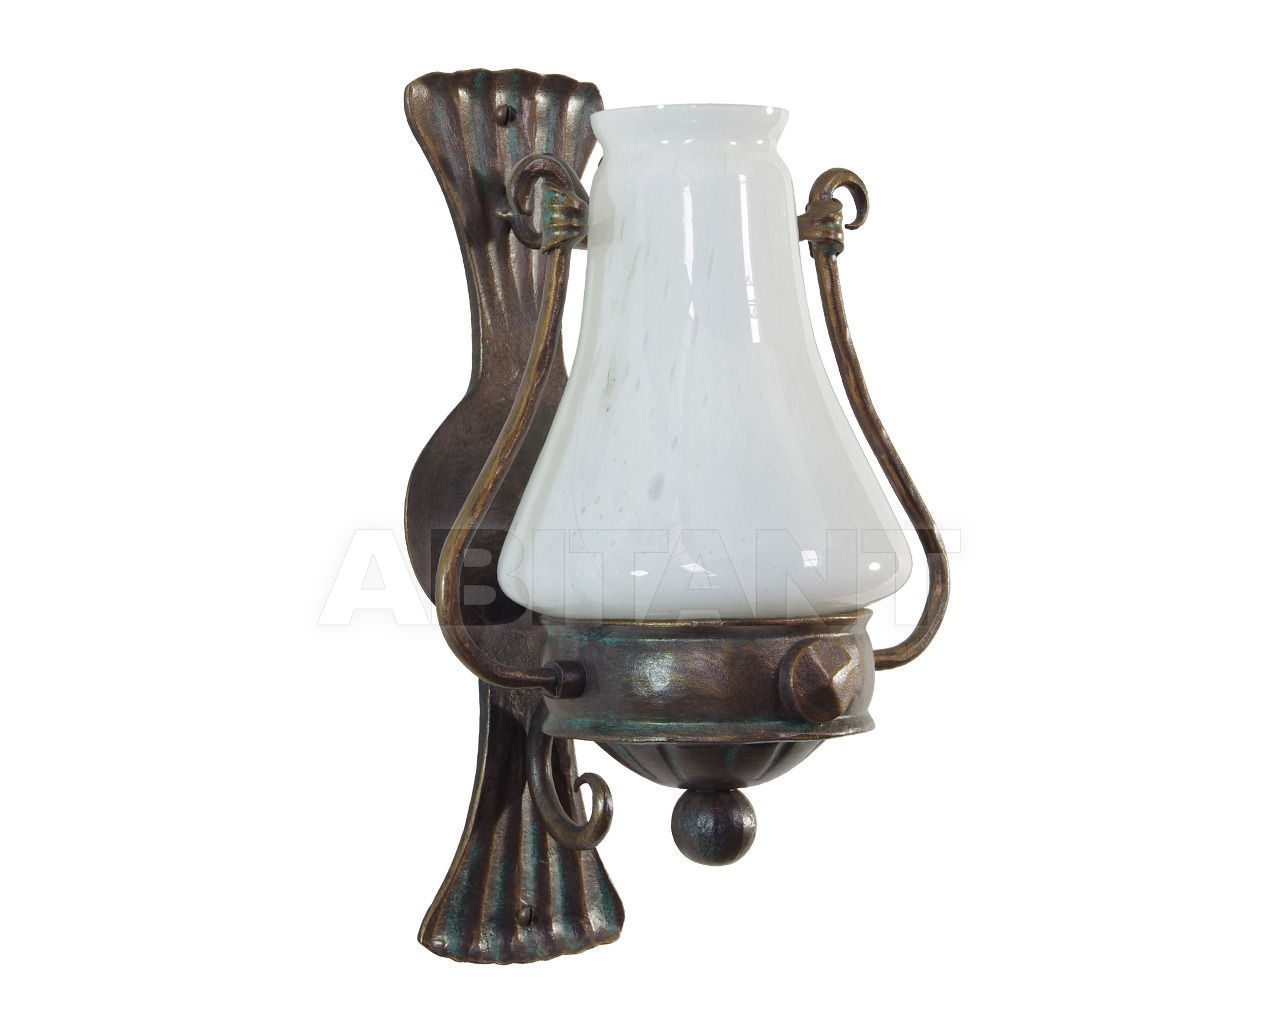 Купить Светильник настенный FMB Leuchten Schmiedeeisen Lampen Und Leuchten 94072